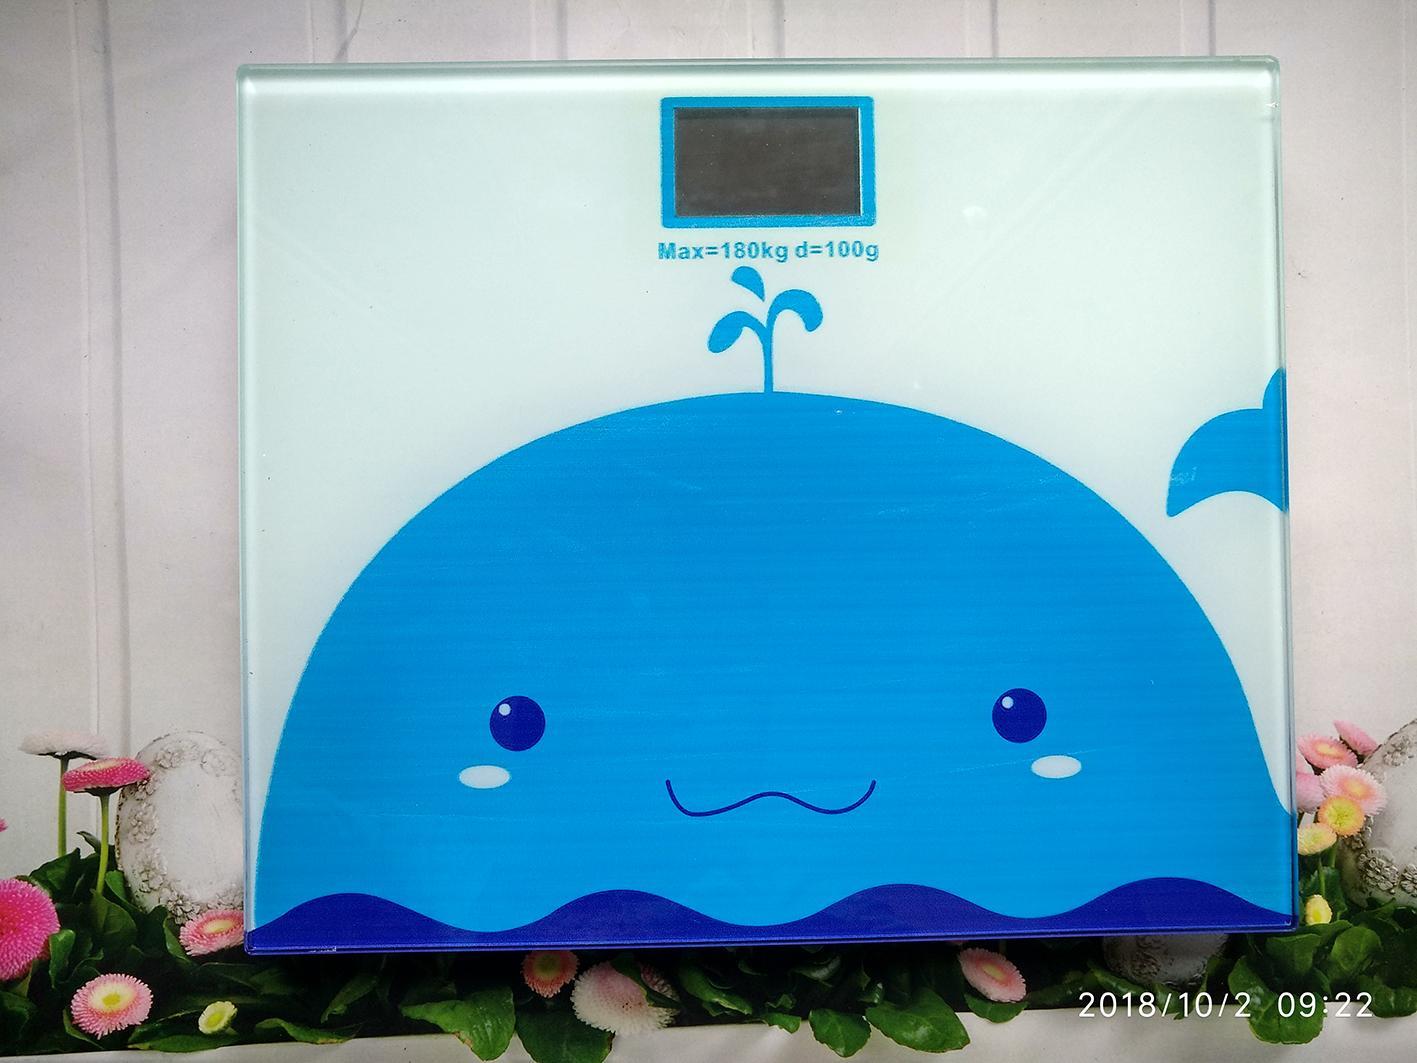 Beli Timbangan Badan Digital 180kg Harga Rp 80000 26cm Personal Scale Weight Free Bubble Bergambar Electronic Body Mini Max